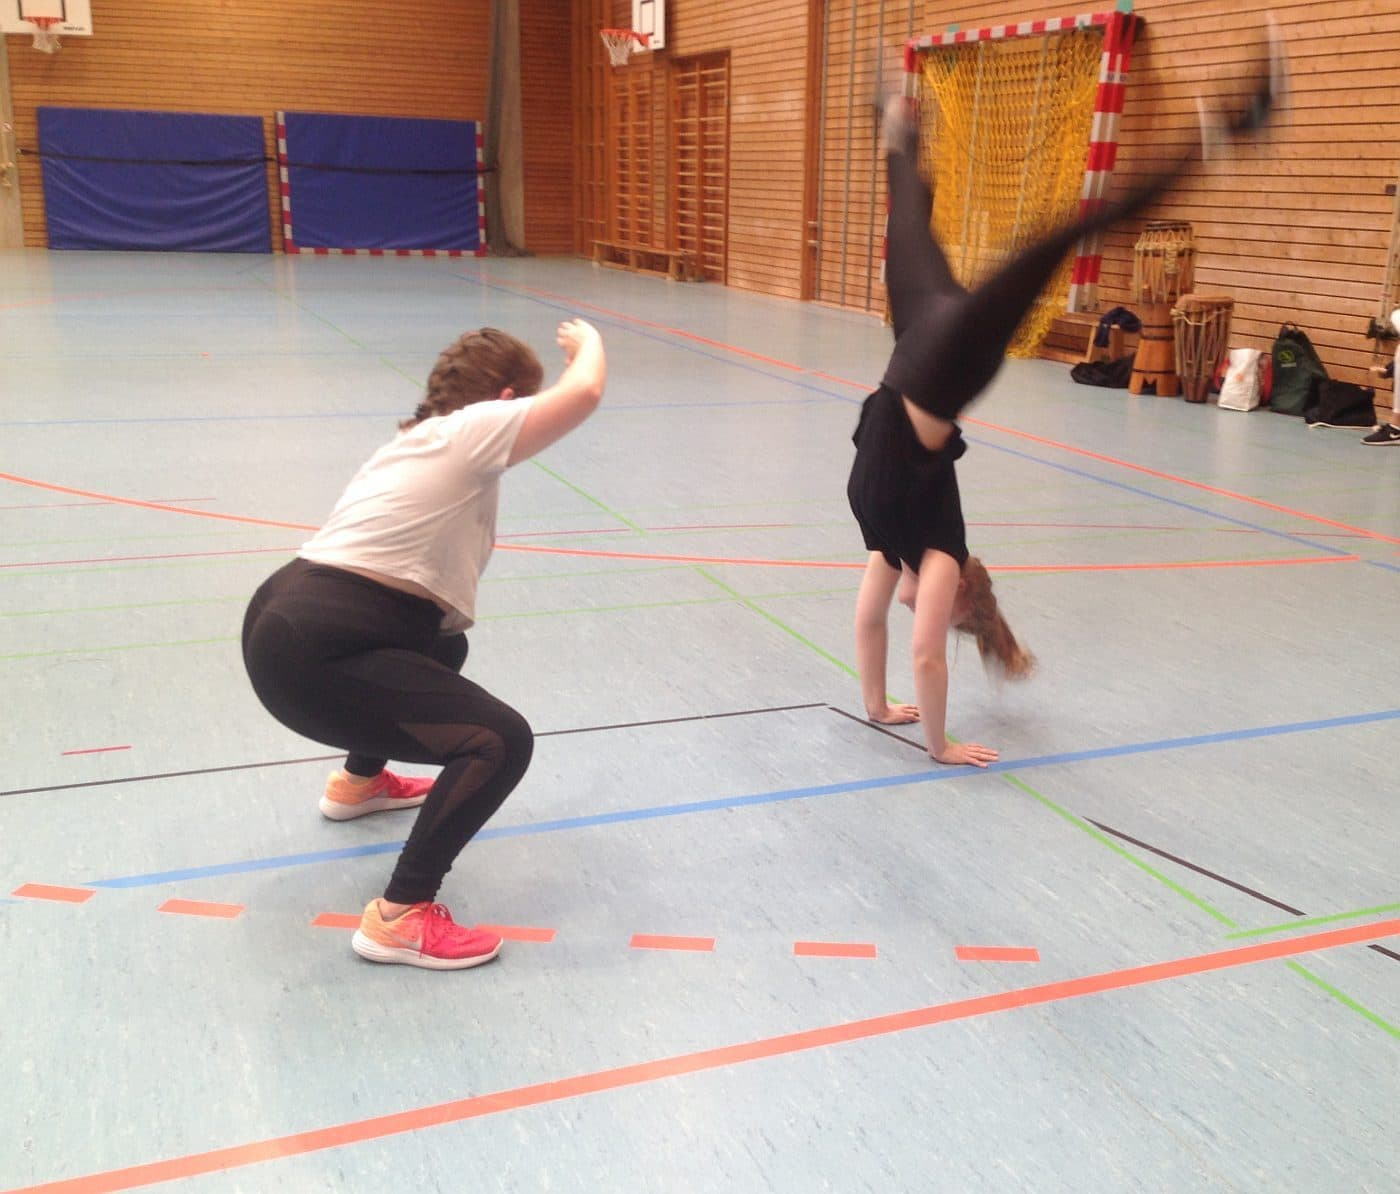 Voller Körpereinsatz beim Capoeira